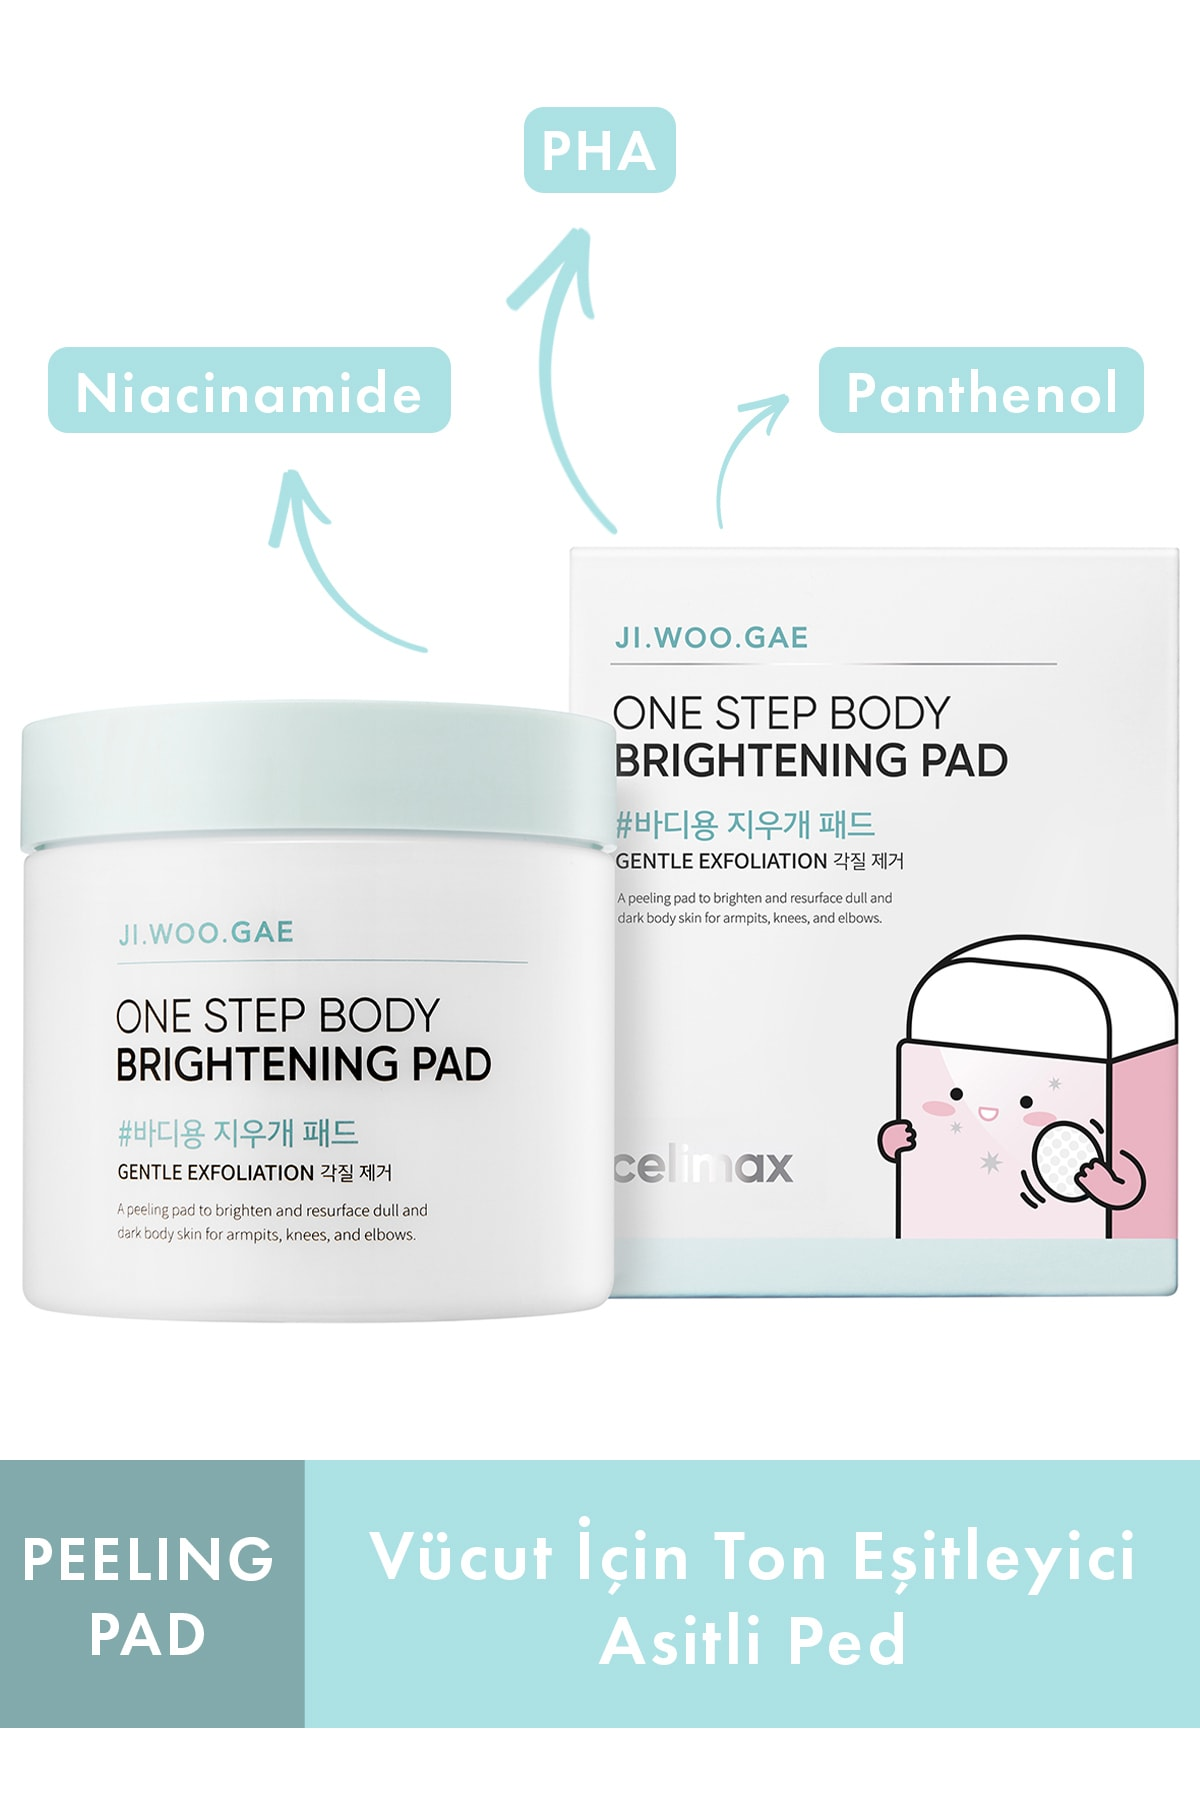 One Step Body Brightening Pad - Renk Açıcı, Parlatıcı Pad Toner (60 Pads / 110ml)